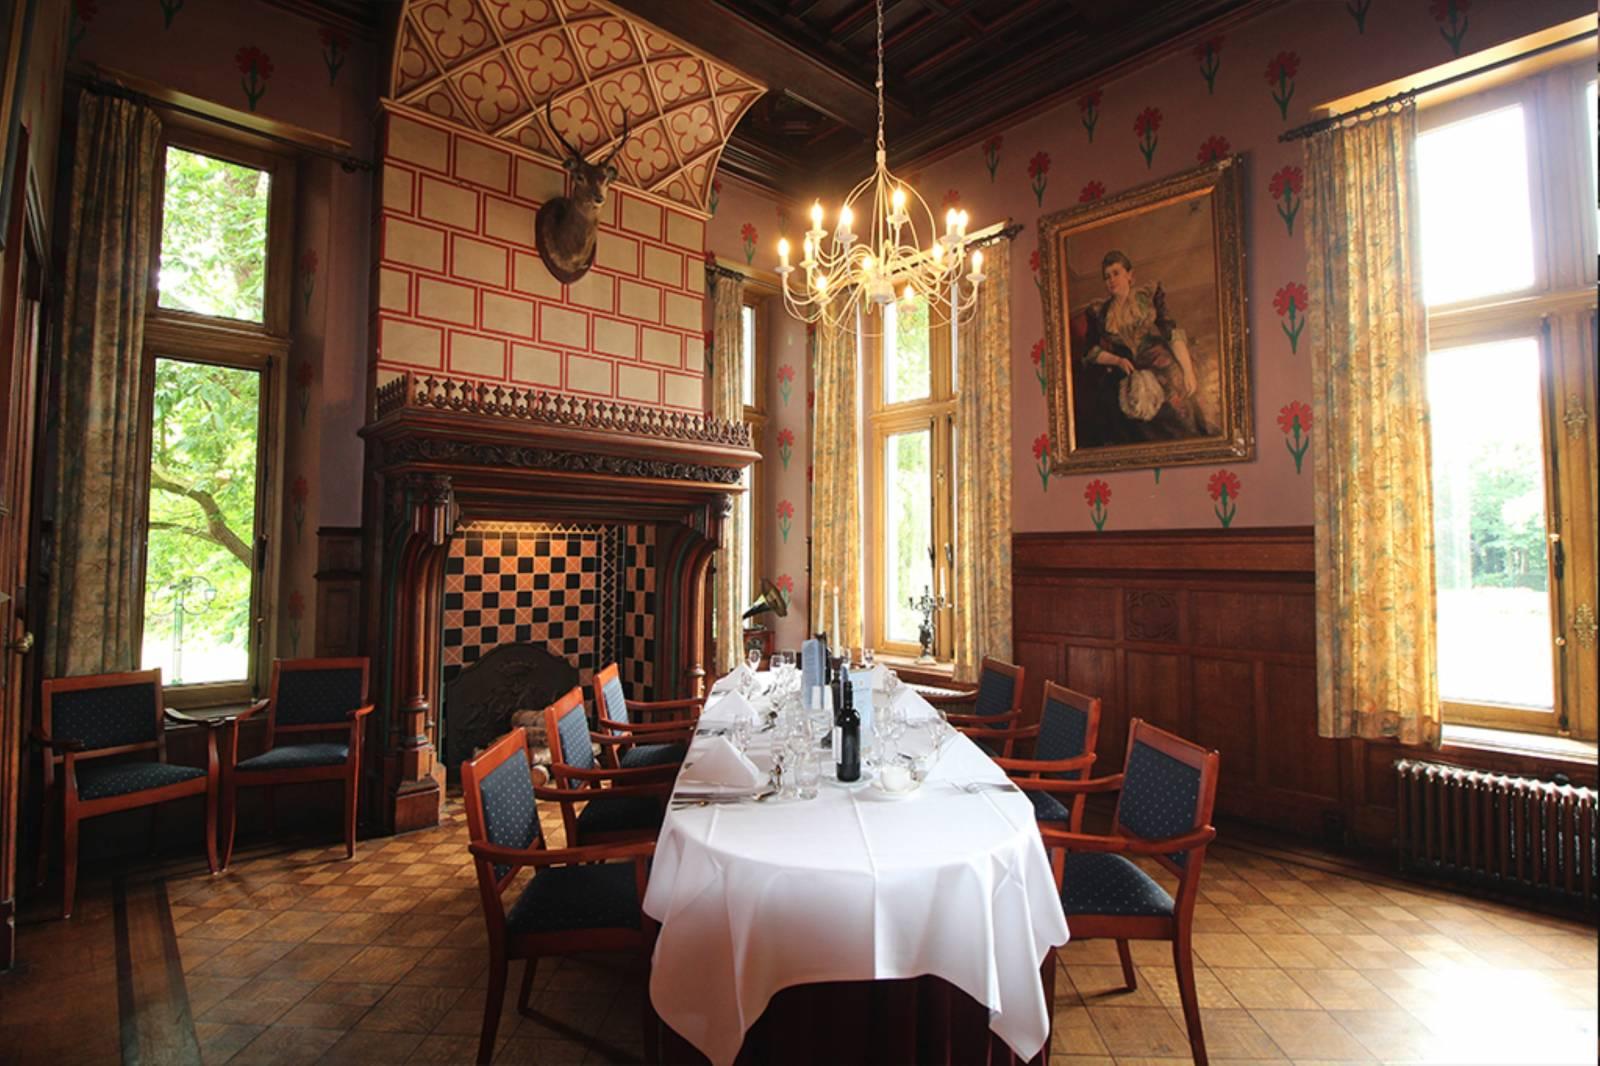 Kasteel D'artrycke - Feestzaal - House of Weddings (16)